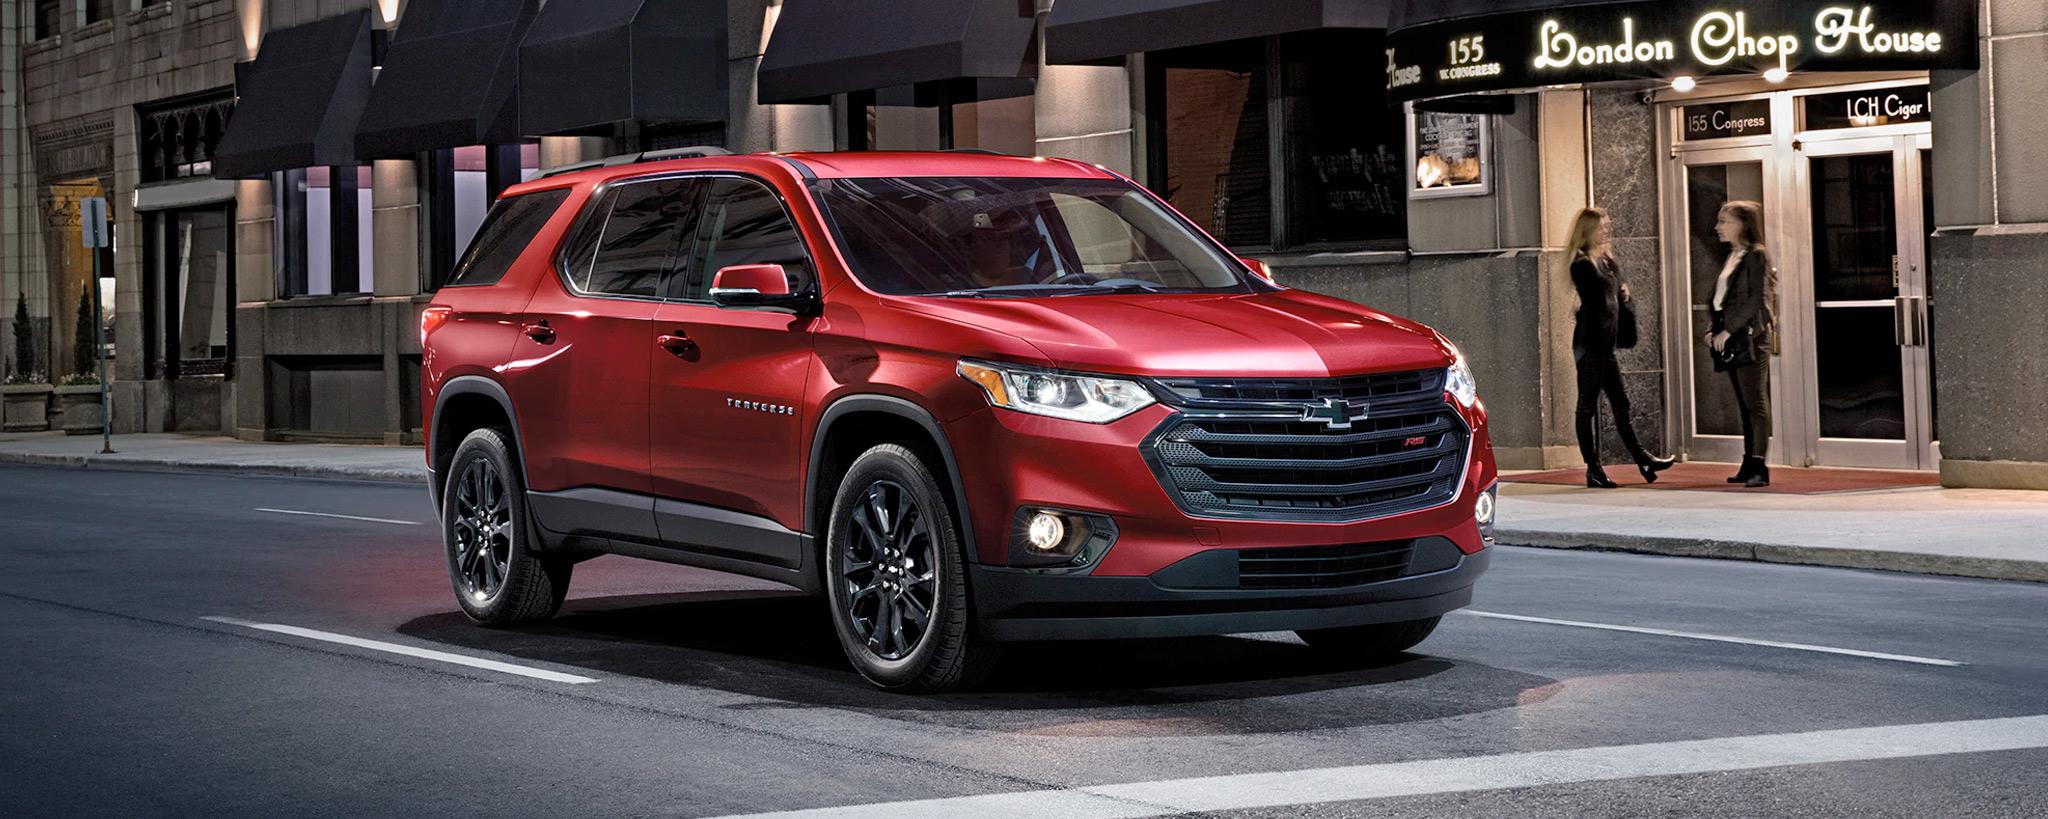 2020 Chevrolet Traverse Front Passenger 3/4 View